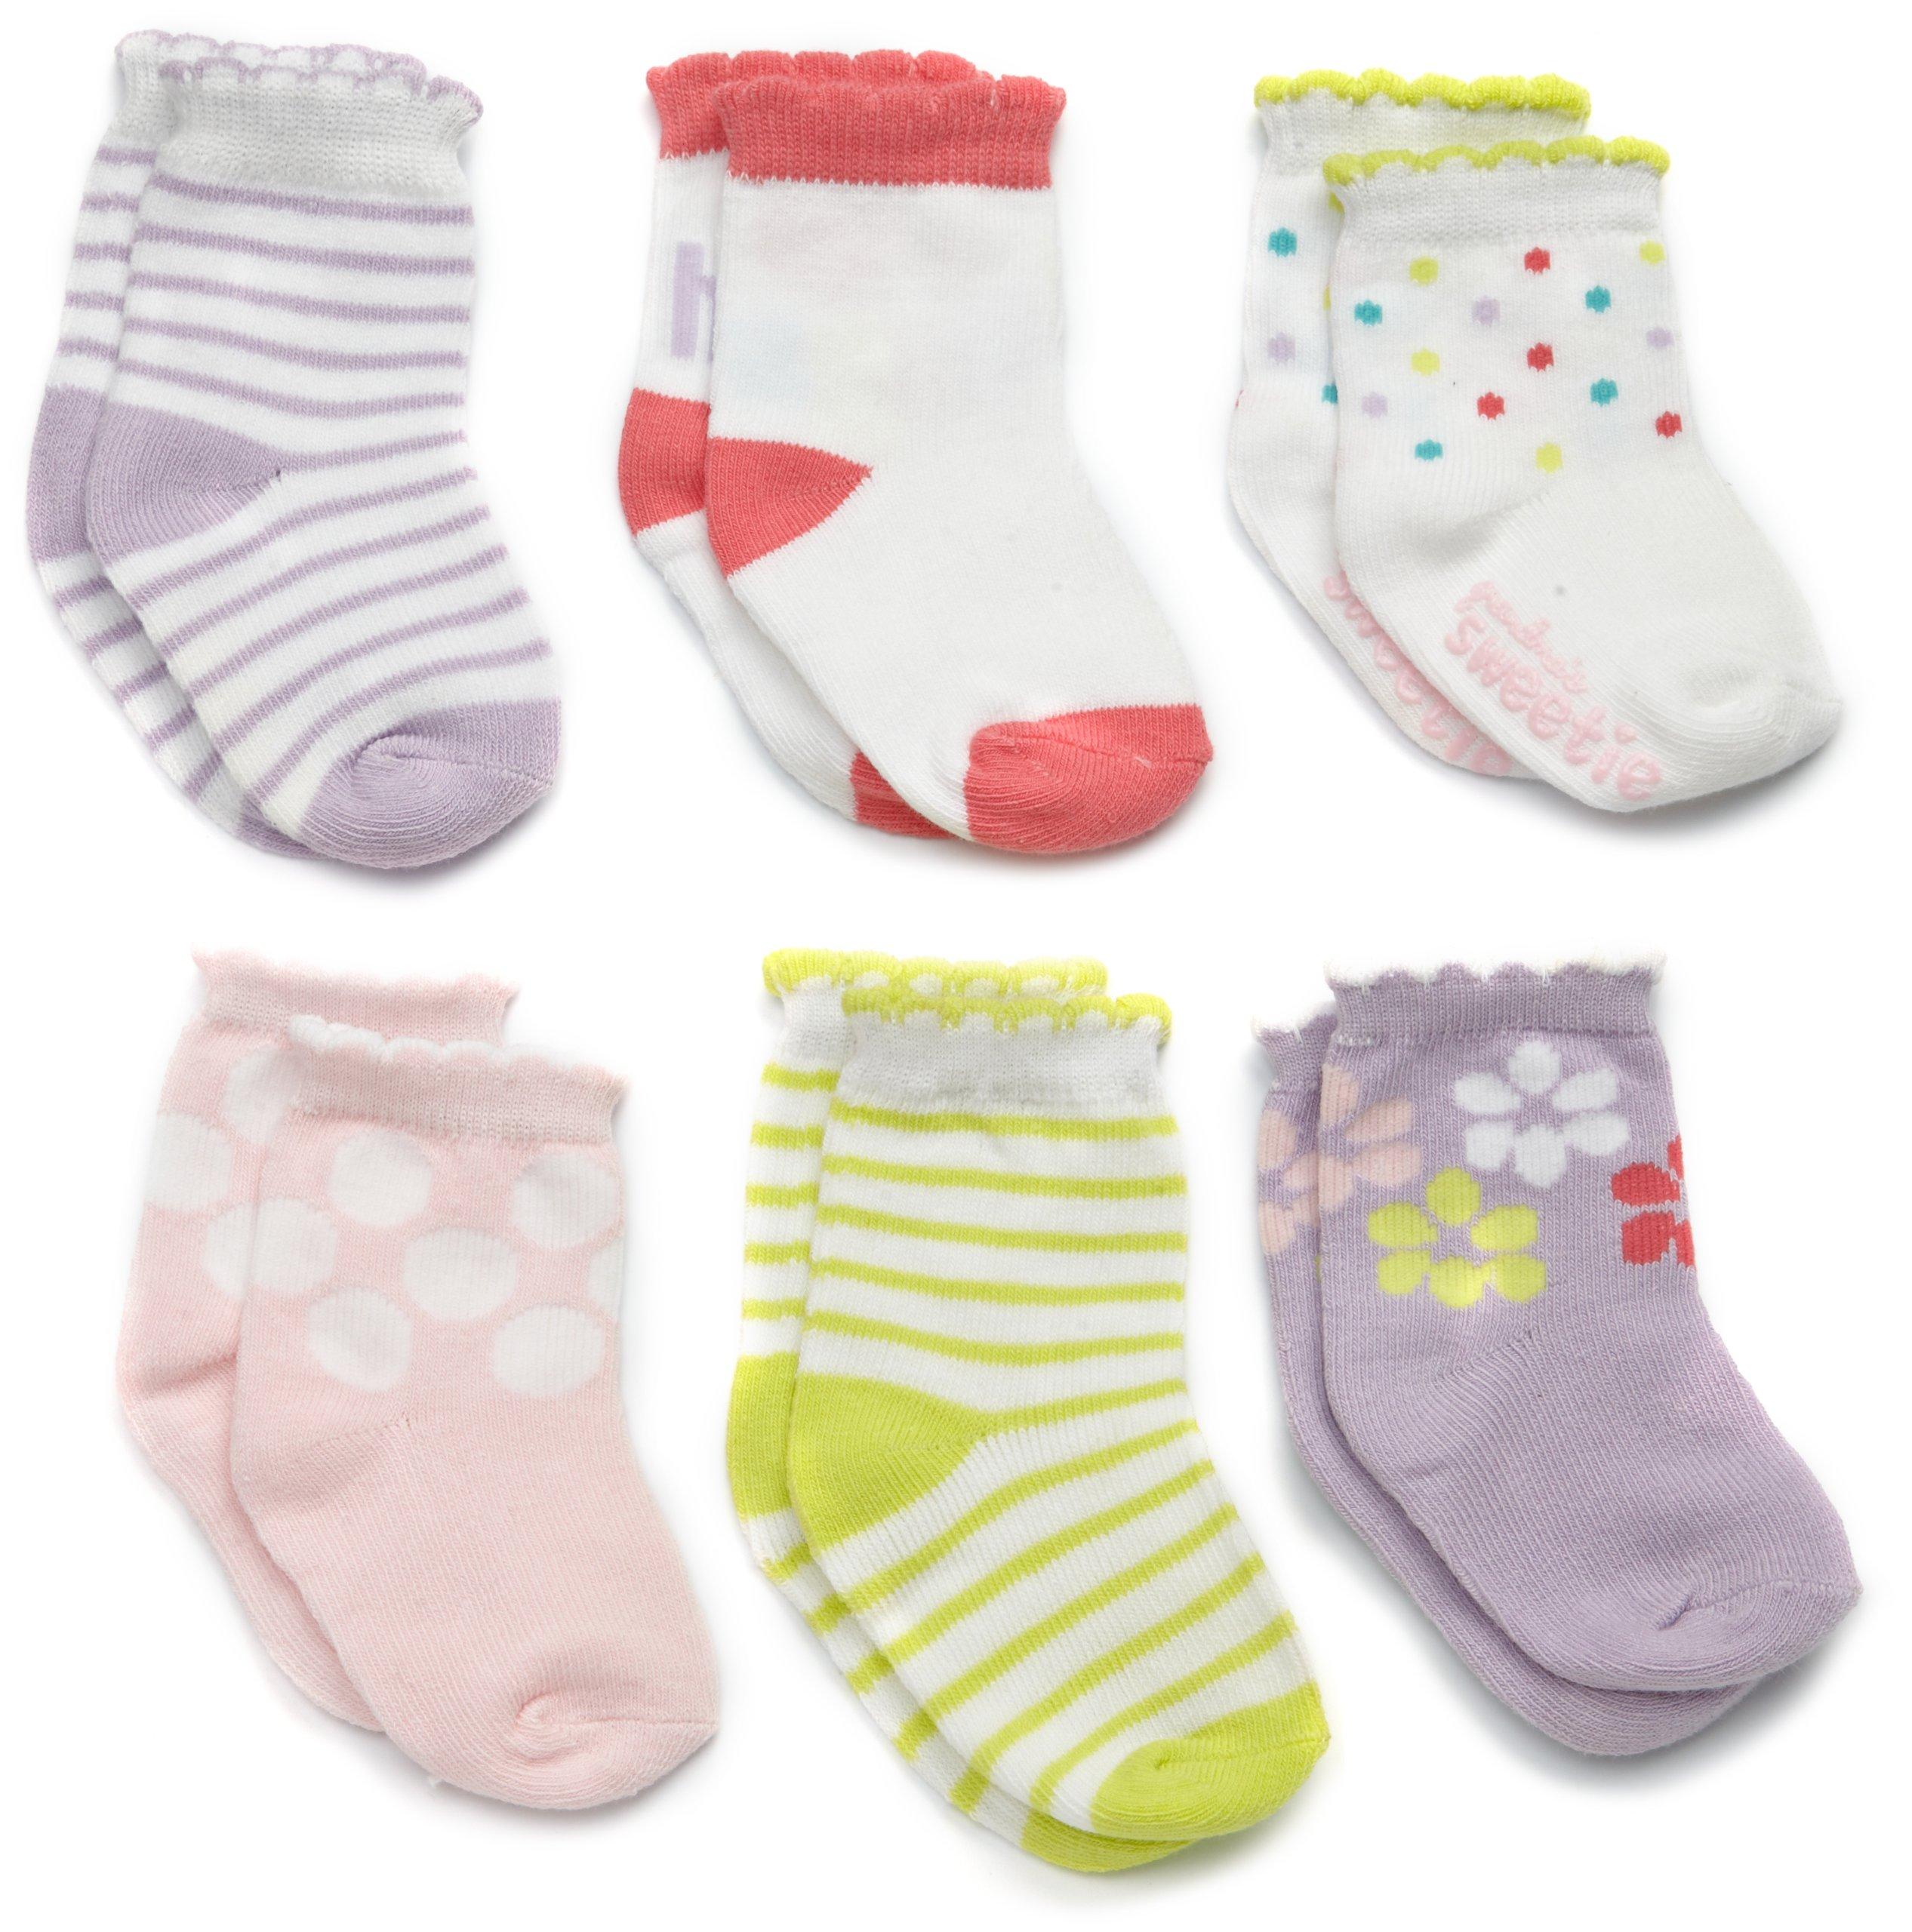 Carter's Hosiery Baby-girls Newborn 6 Pack Comp Hugs Socks, Assorted Colors, 3-12 Months